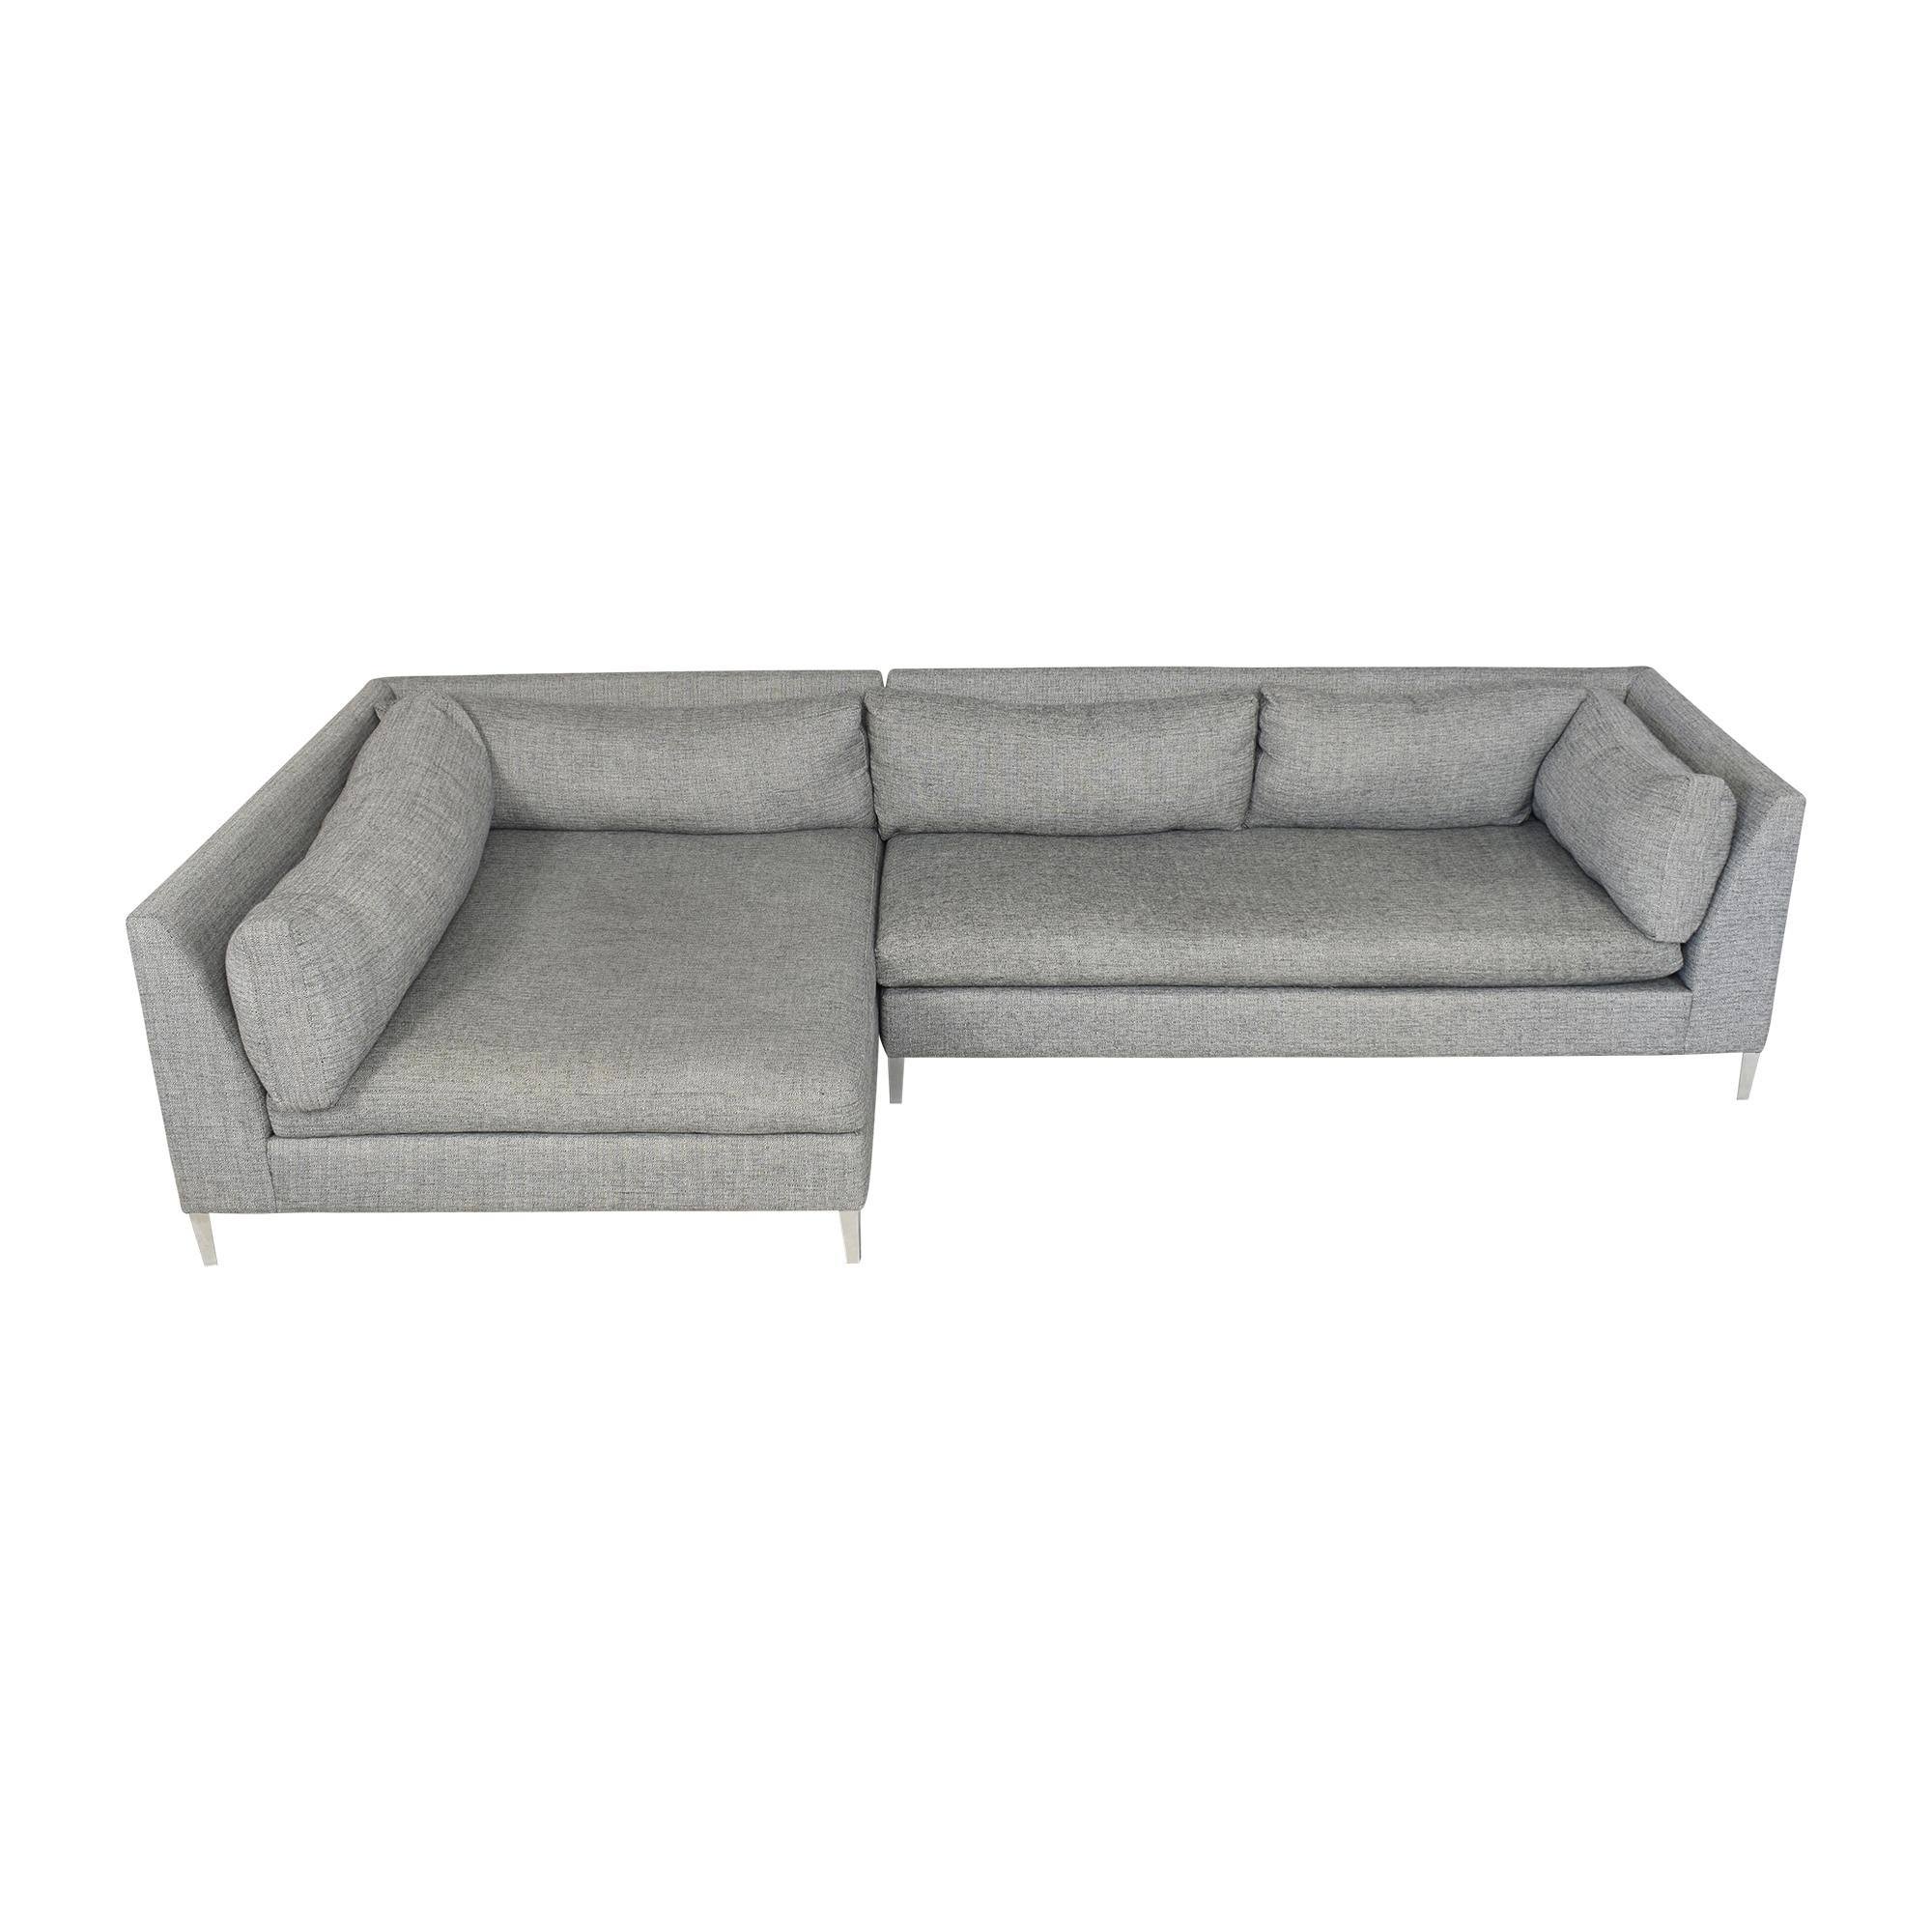 CB2 Decker Two Piece Sectional Sofa / Sofas